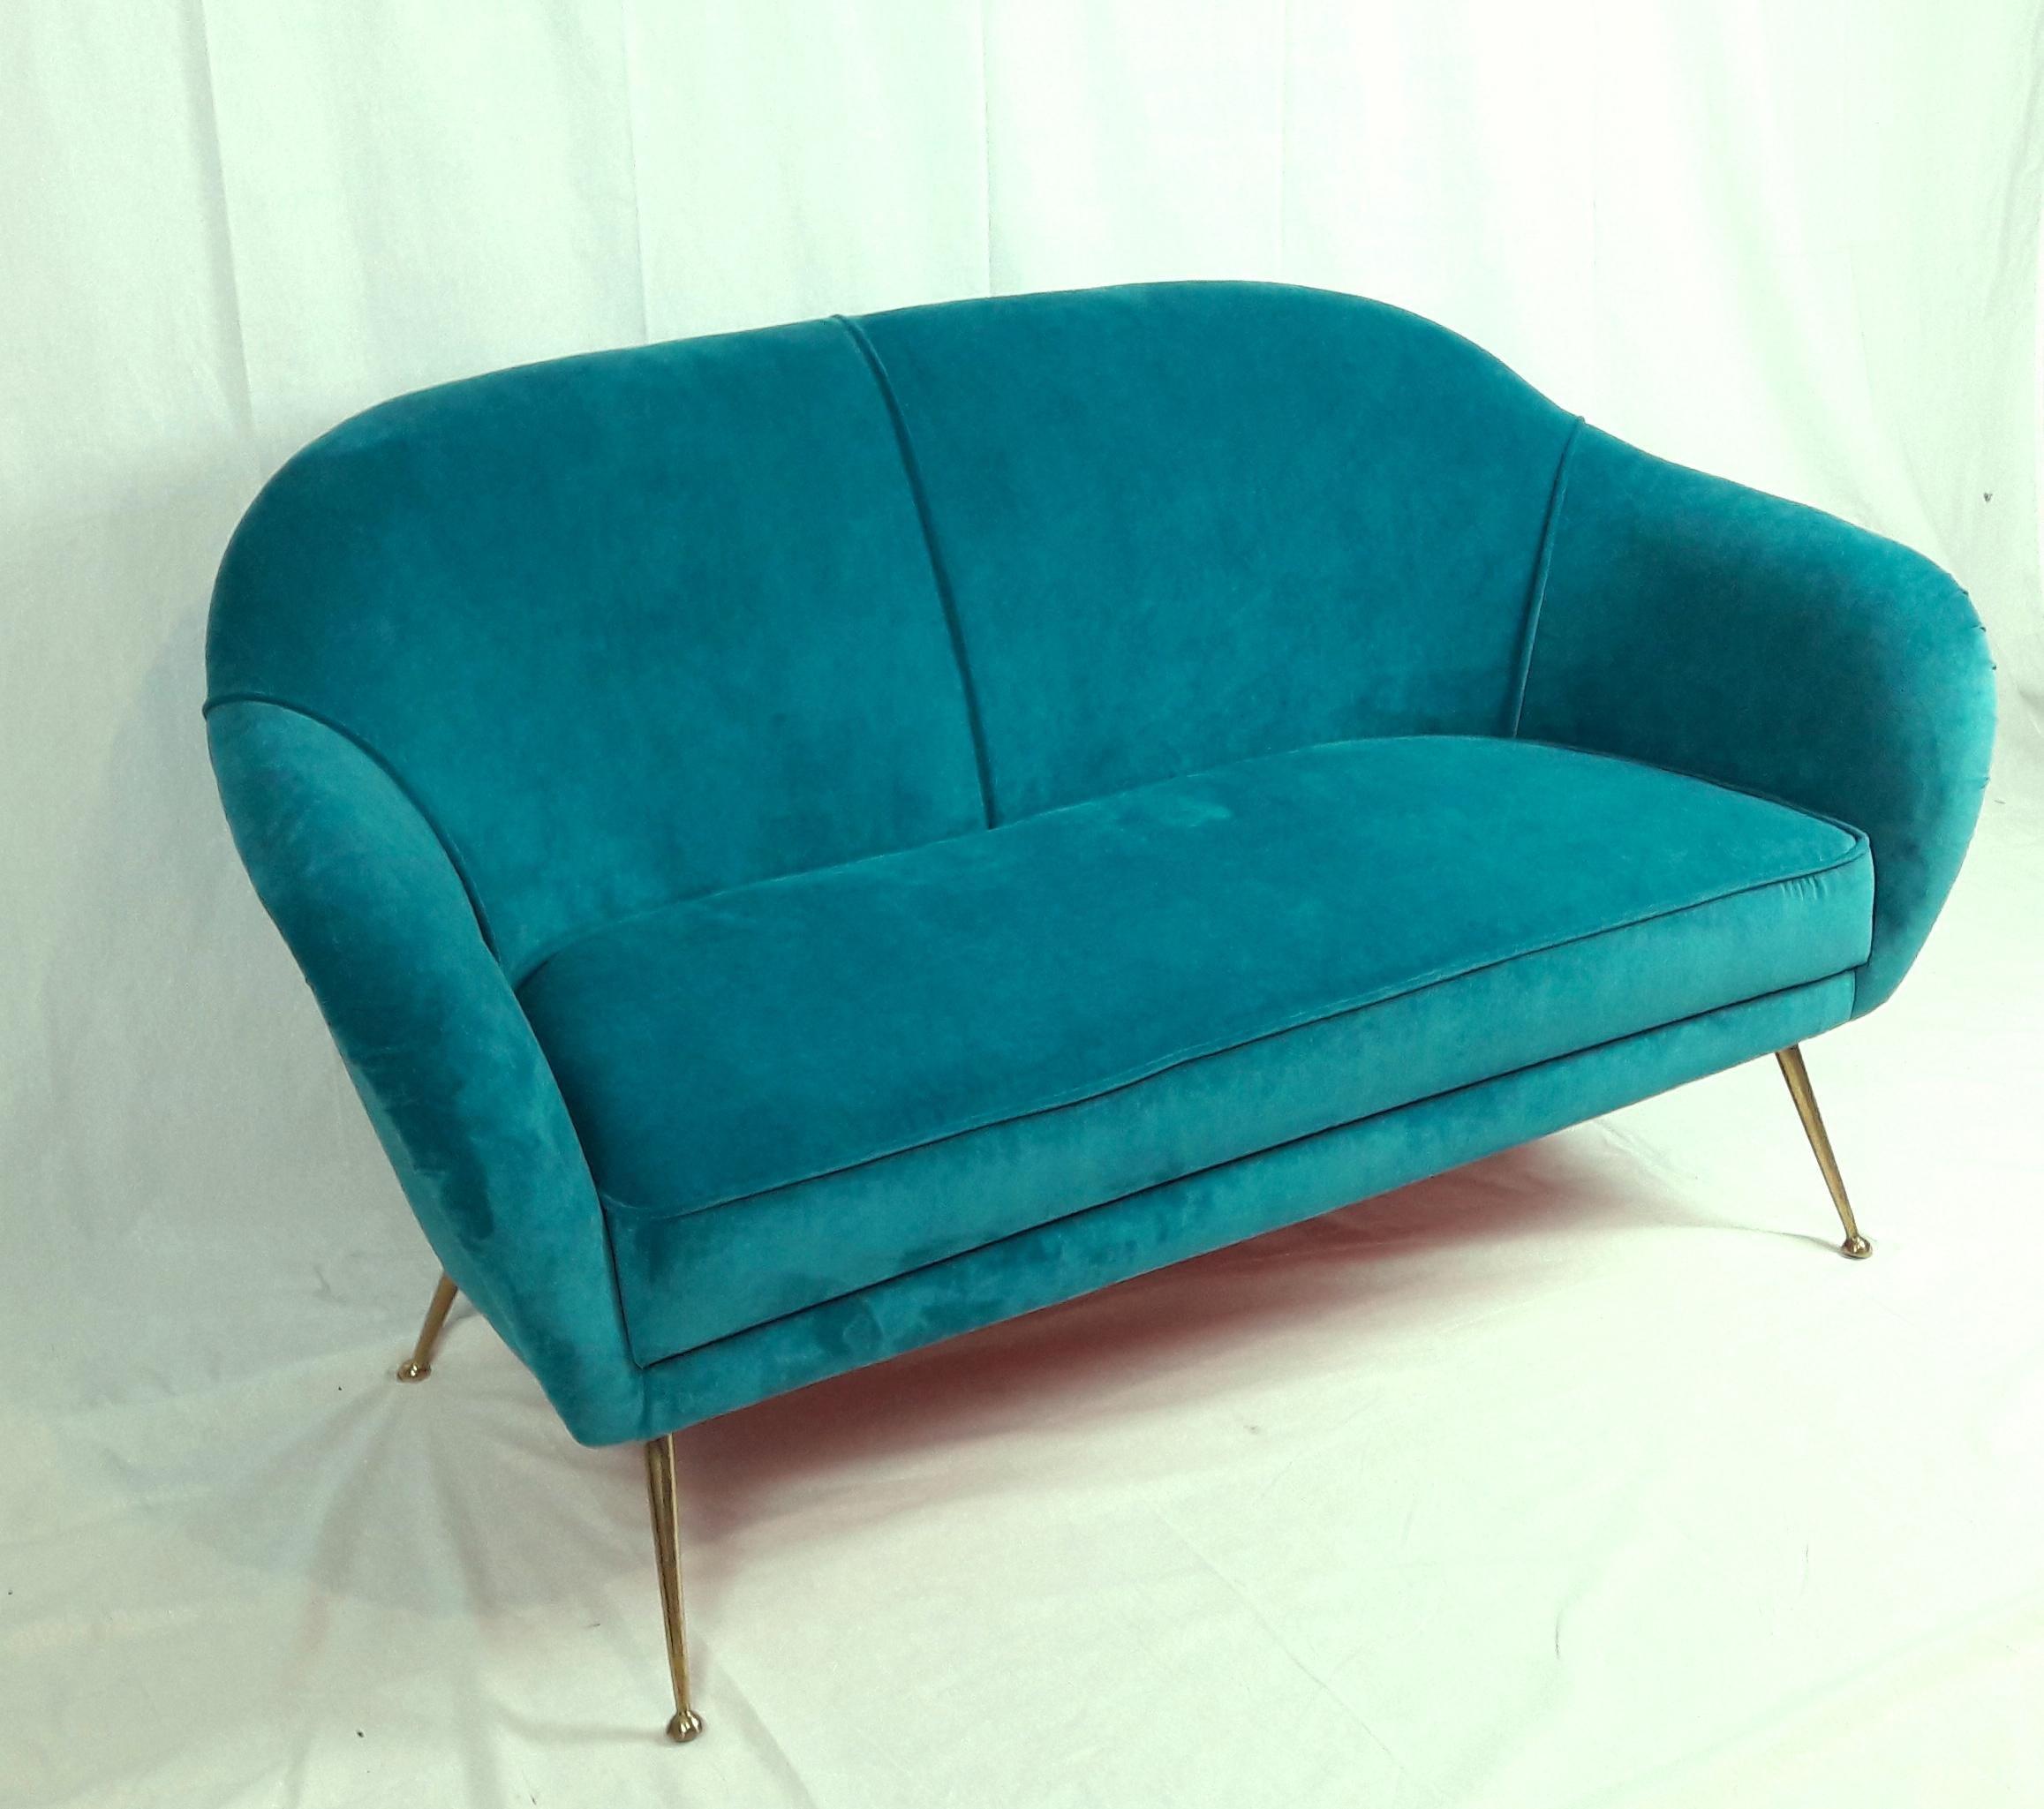 Perfect Mid 20th Century Mid Century Modern Italian Turquoise Velvet Sofa, 1950s  For Sale